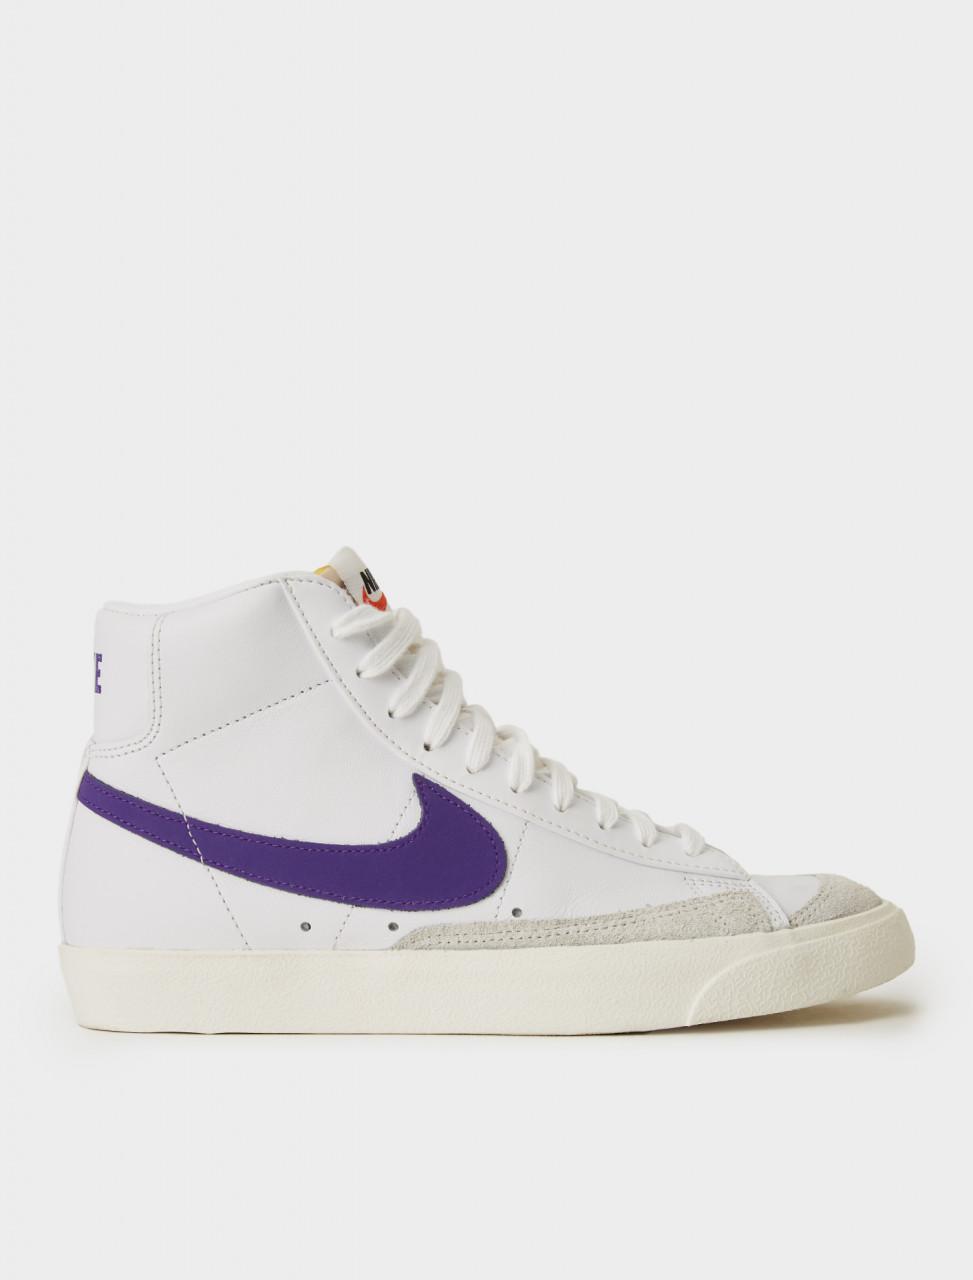 Nike WMNS Blazer Mid '77 Sneaker in Voltage Purple details